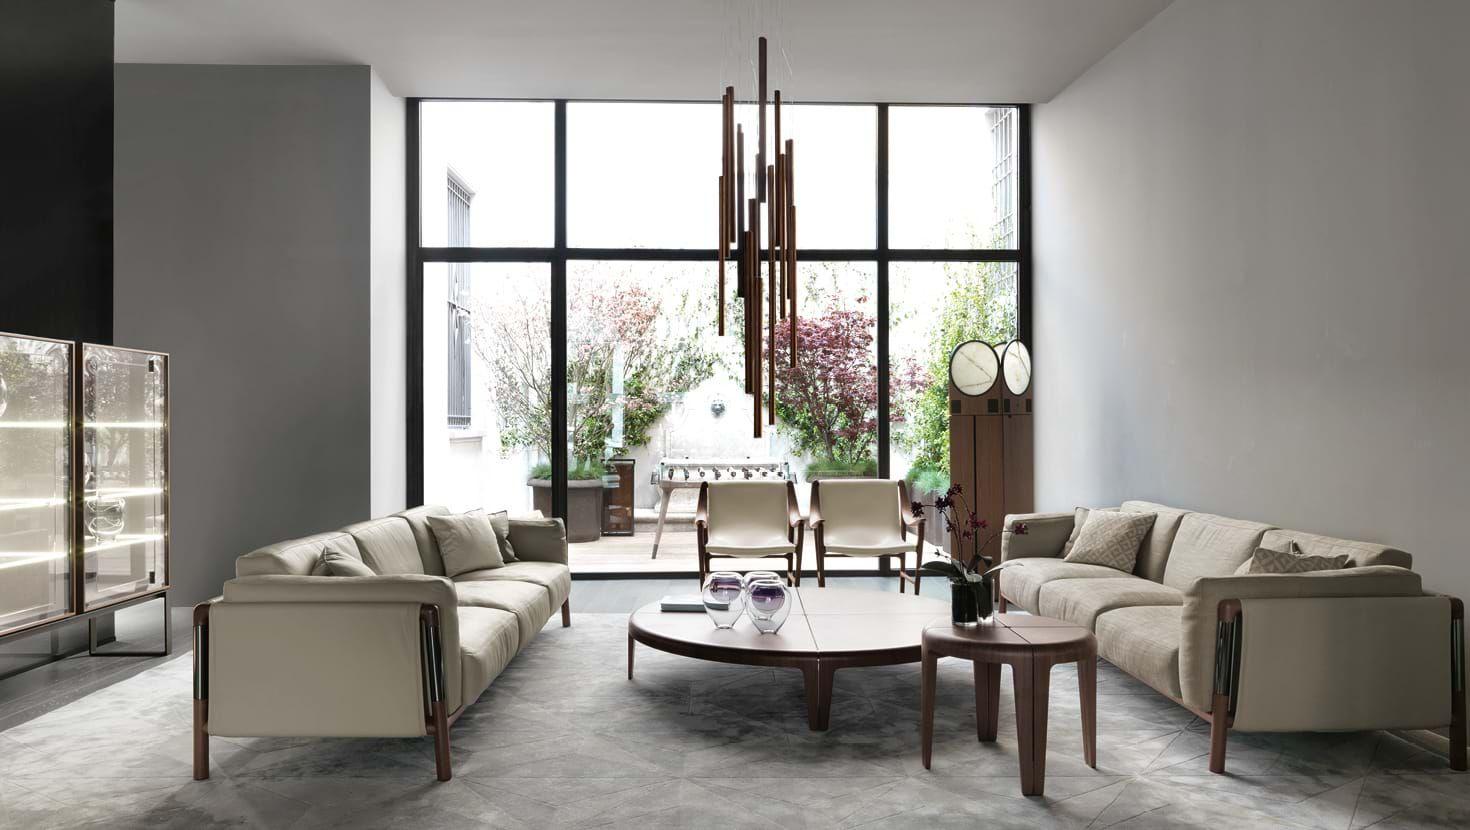 Urban Sofas 3 Furniture design, Hotel